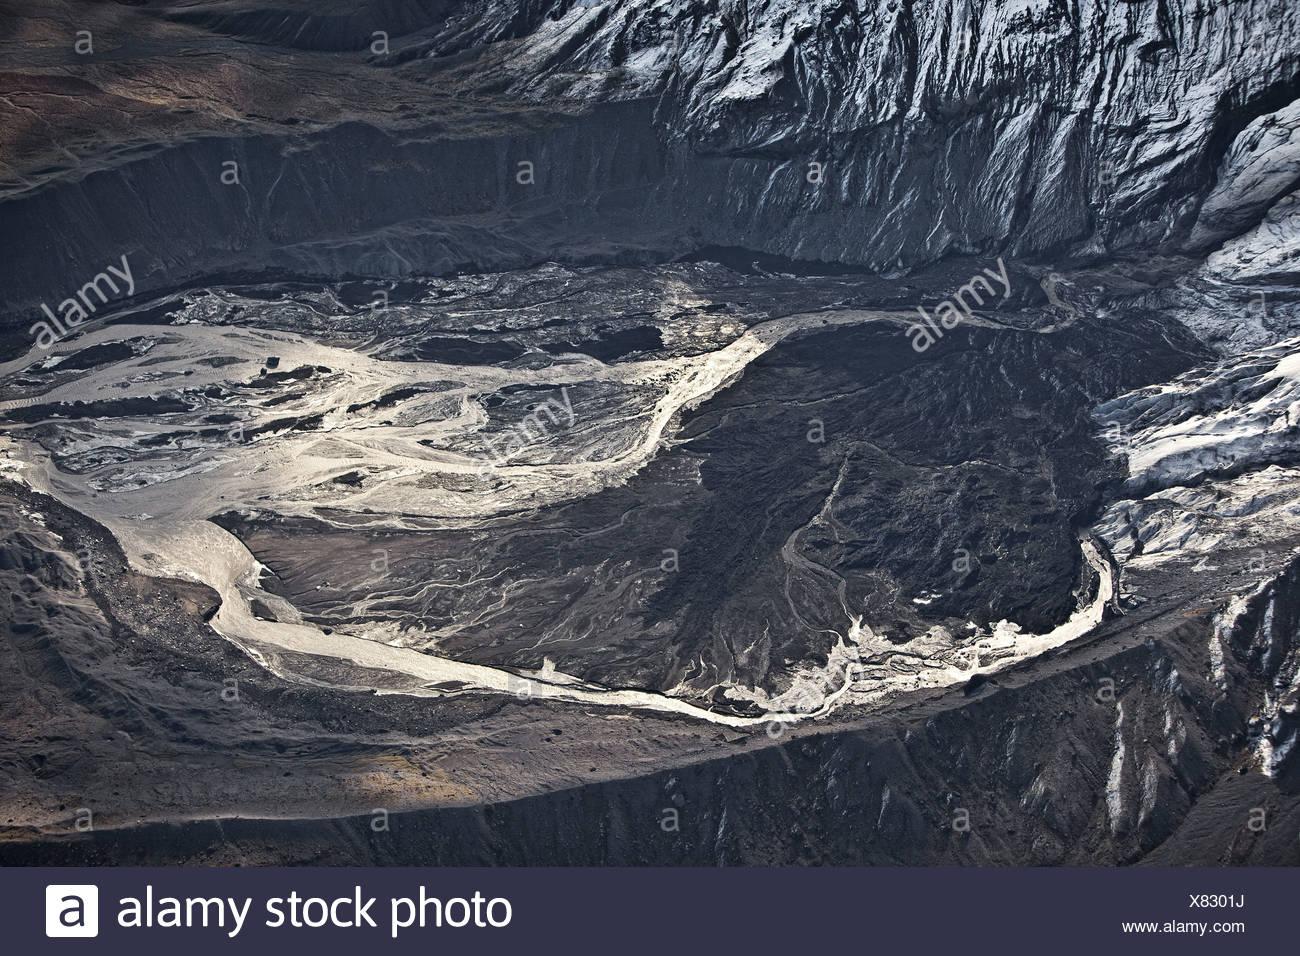 Gigjokull,-Steckdose Gletscher von Eyjafjallajökull.  Lagune gefüllt mit Schlamm und Asche, Vulkanausbruch Eyjafjallajökull, Island Stockbild